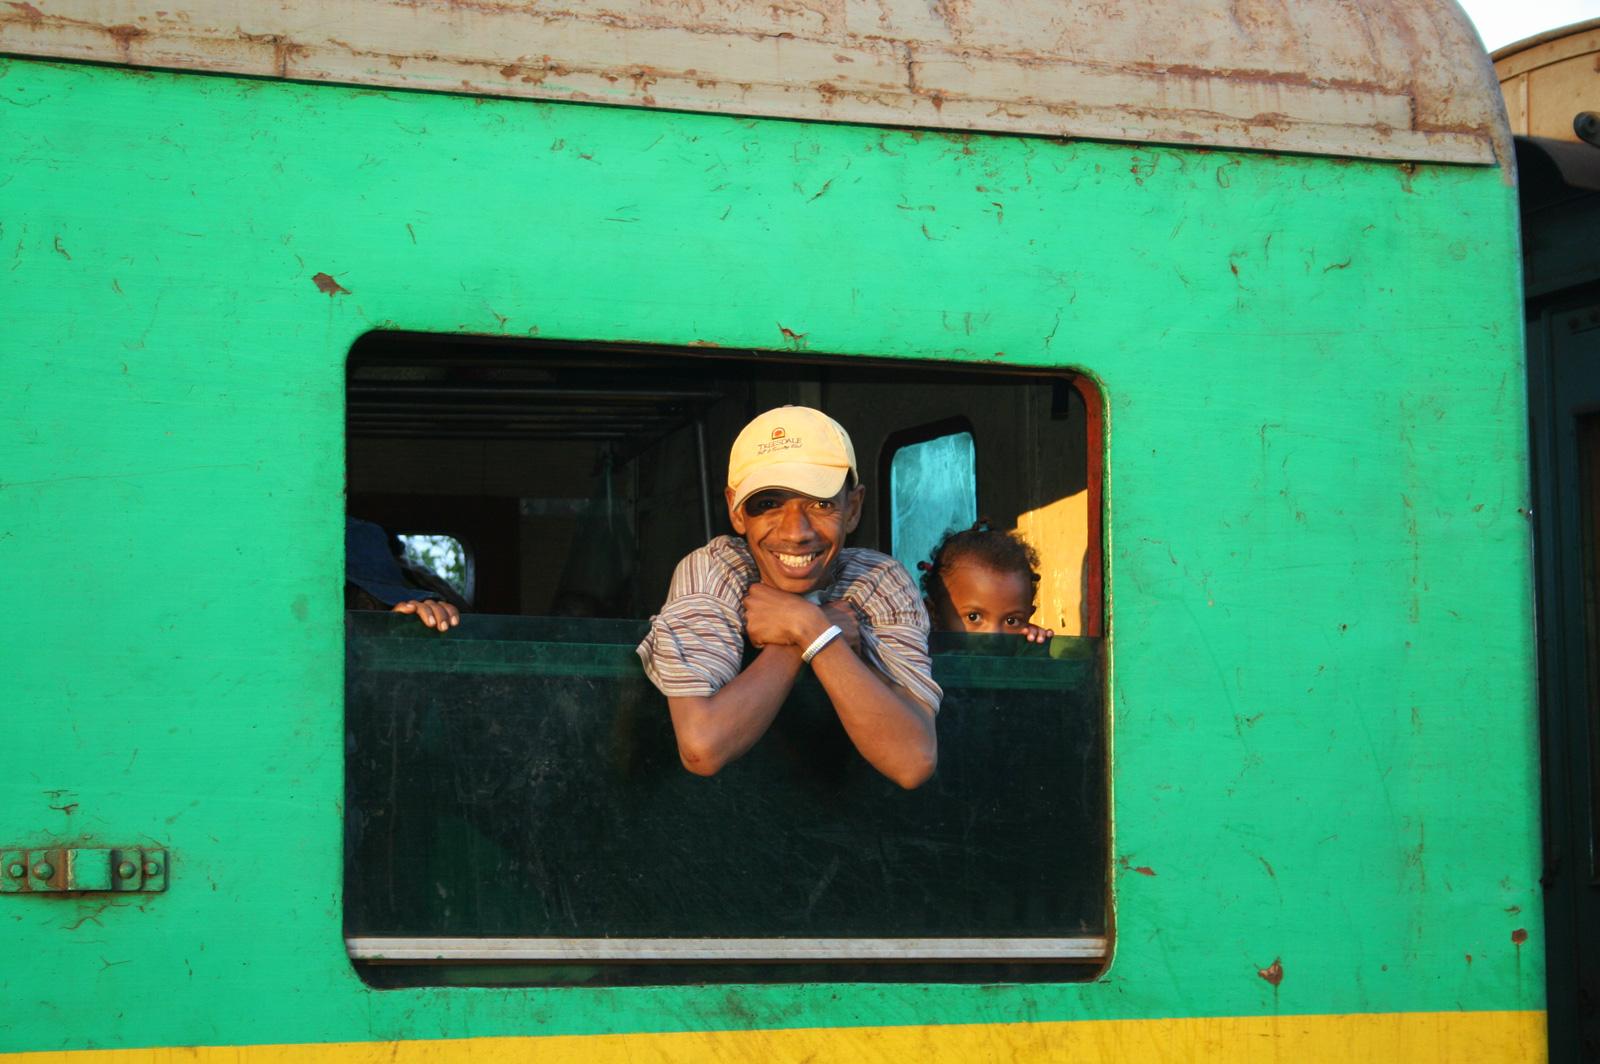 Transport-local-madagascar-train-vapeur-OliverTrips-4